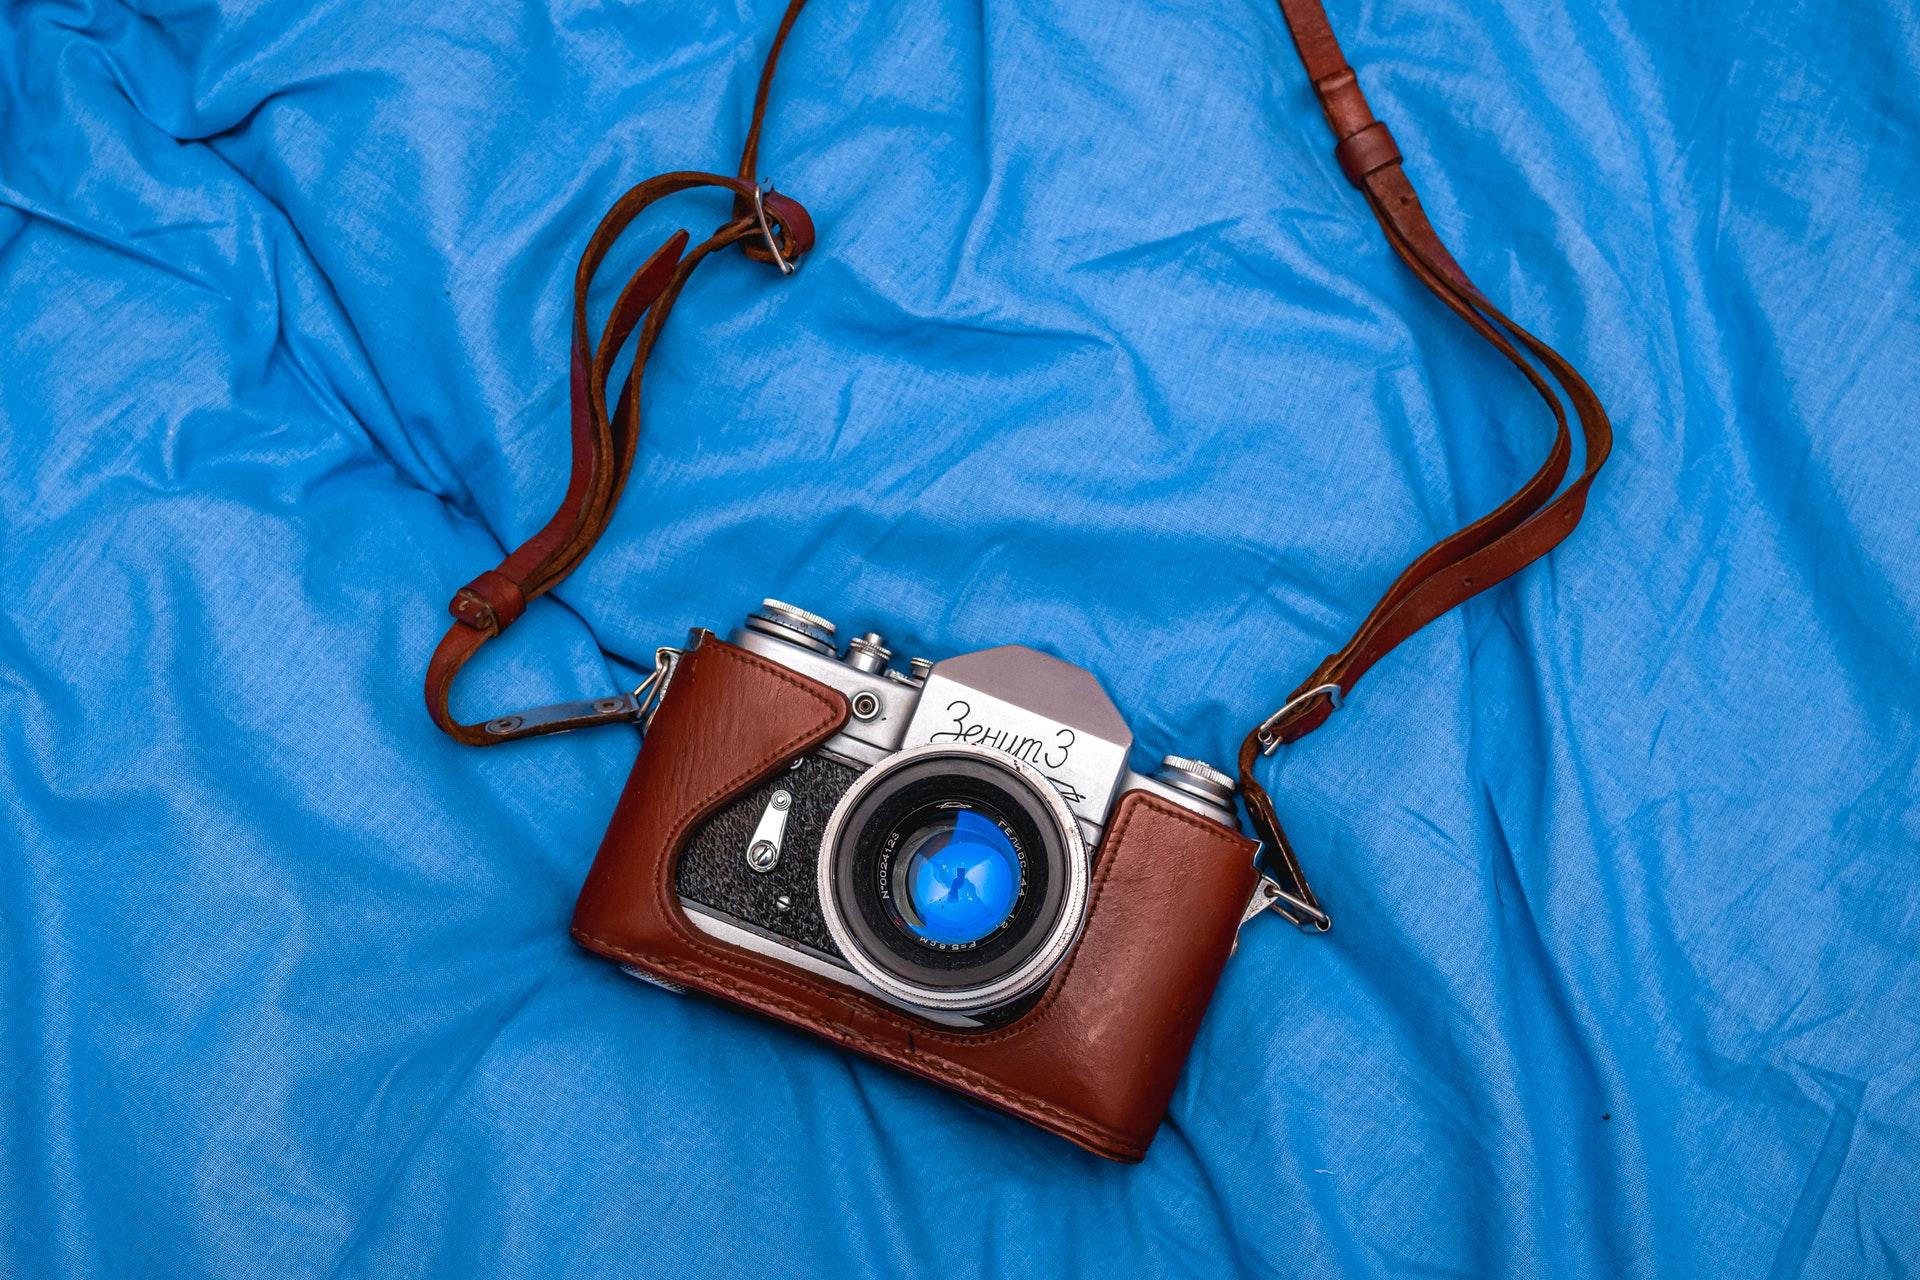 Zenit 3 camera (Pic: Artem Beliaikin/Pexels)